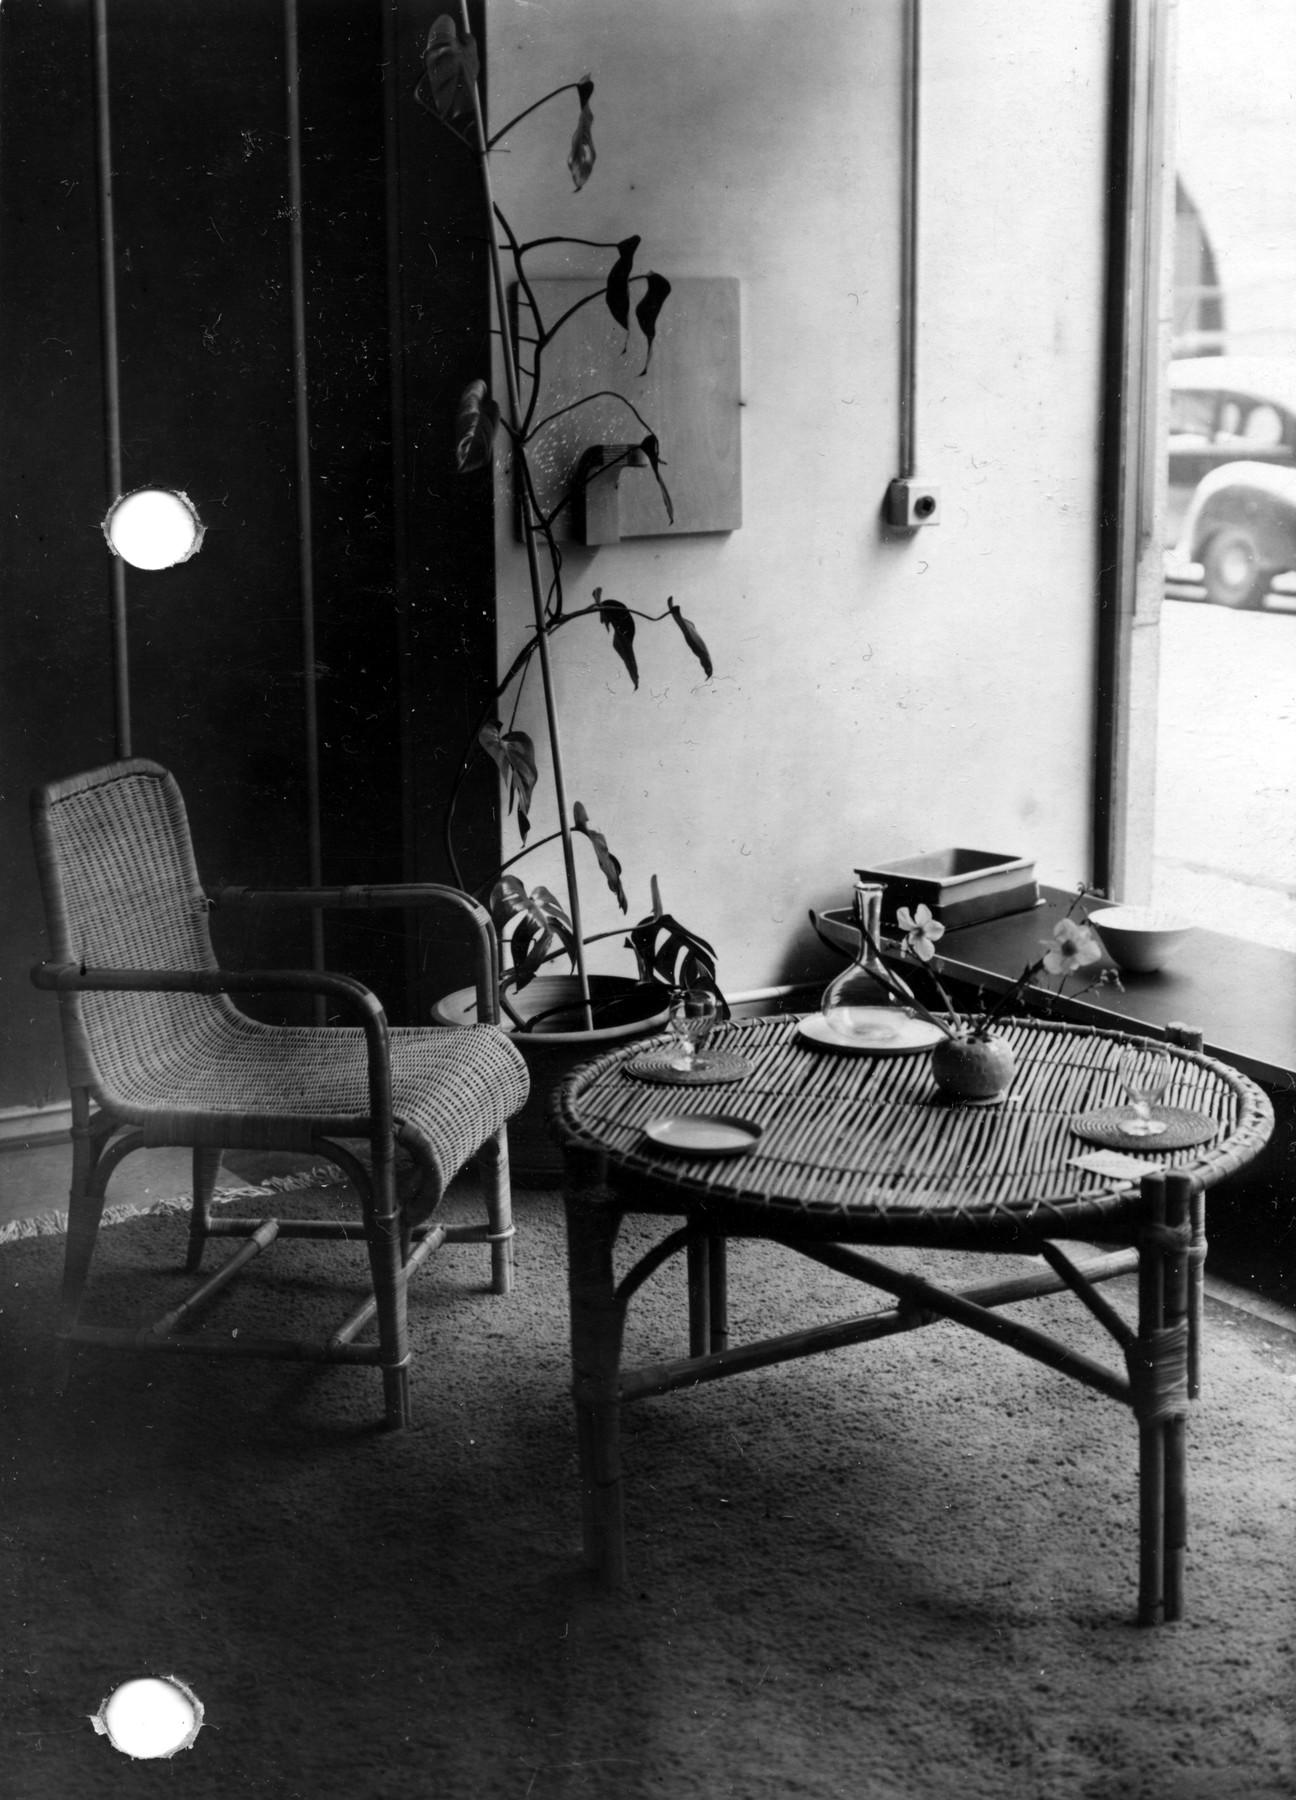 1846875 Fabianinkatu first Artek store in Helsinki 1936 master